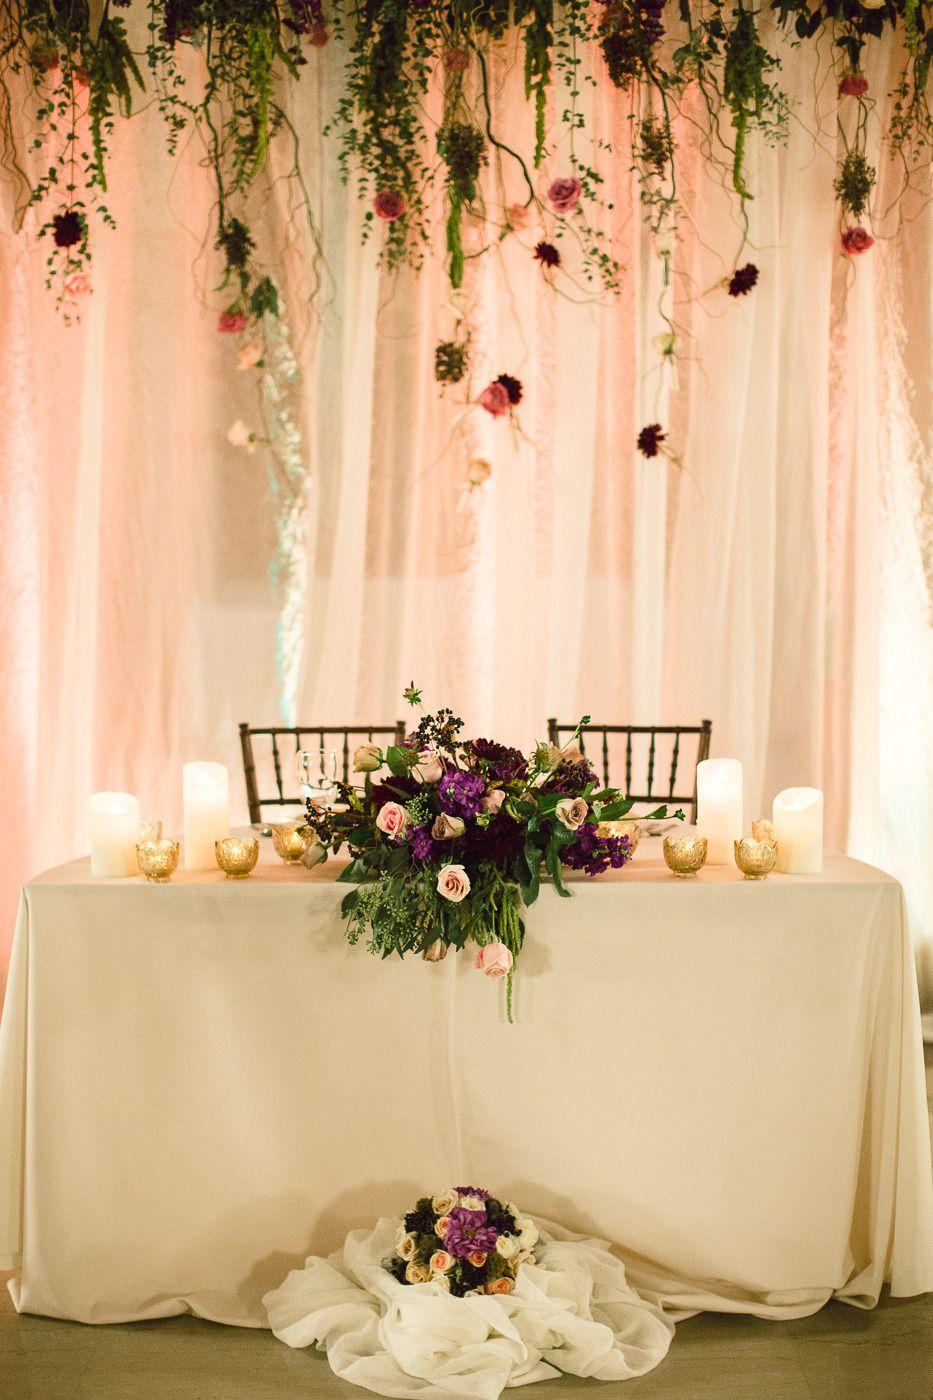 Cleveland City Hall Rotunda Wedding | Head table wedding, Wedding ...